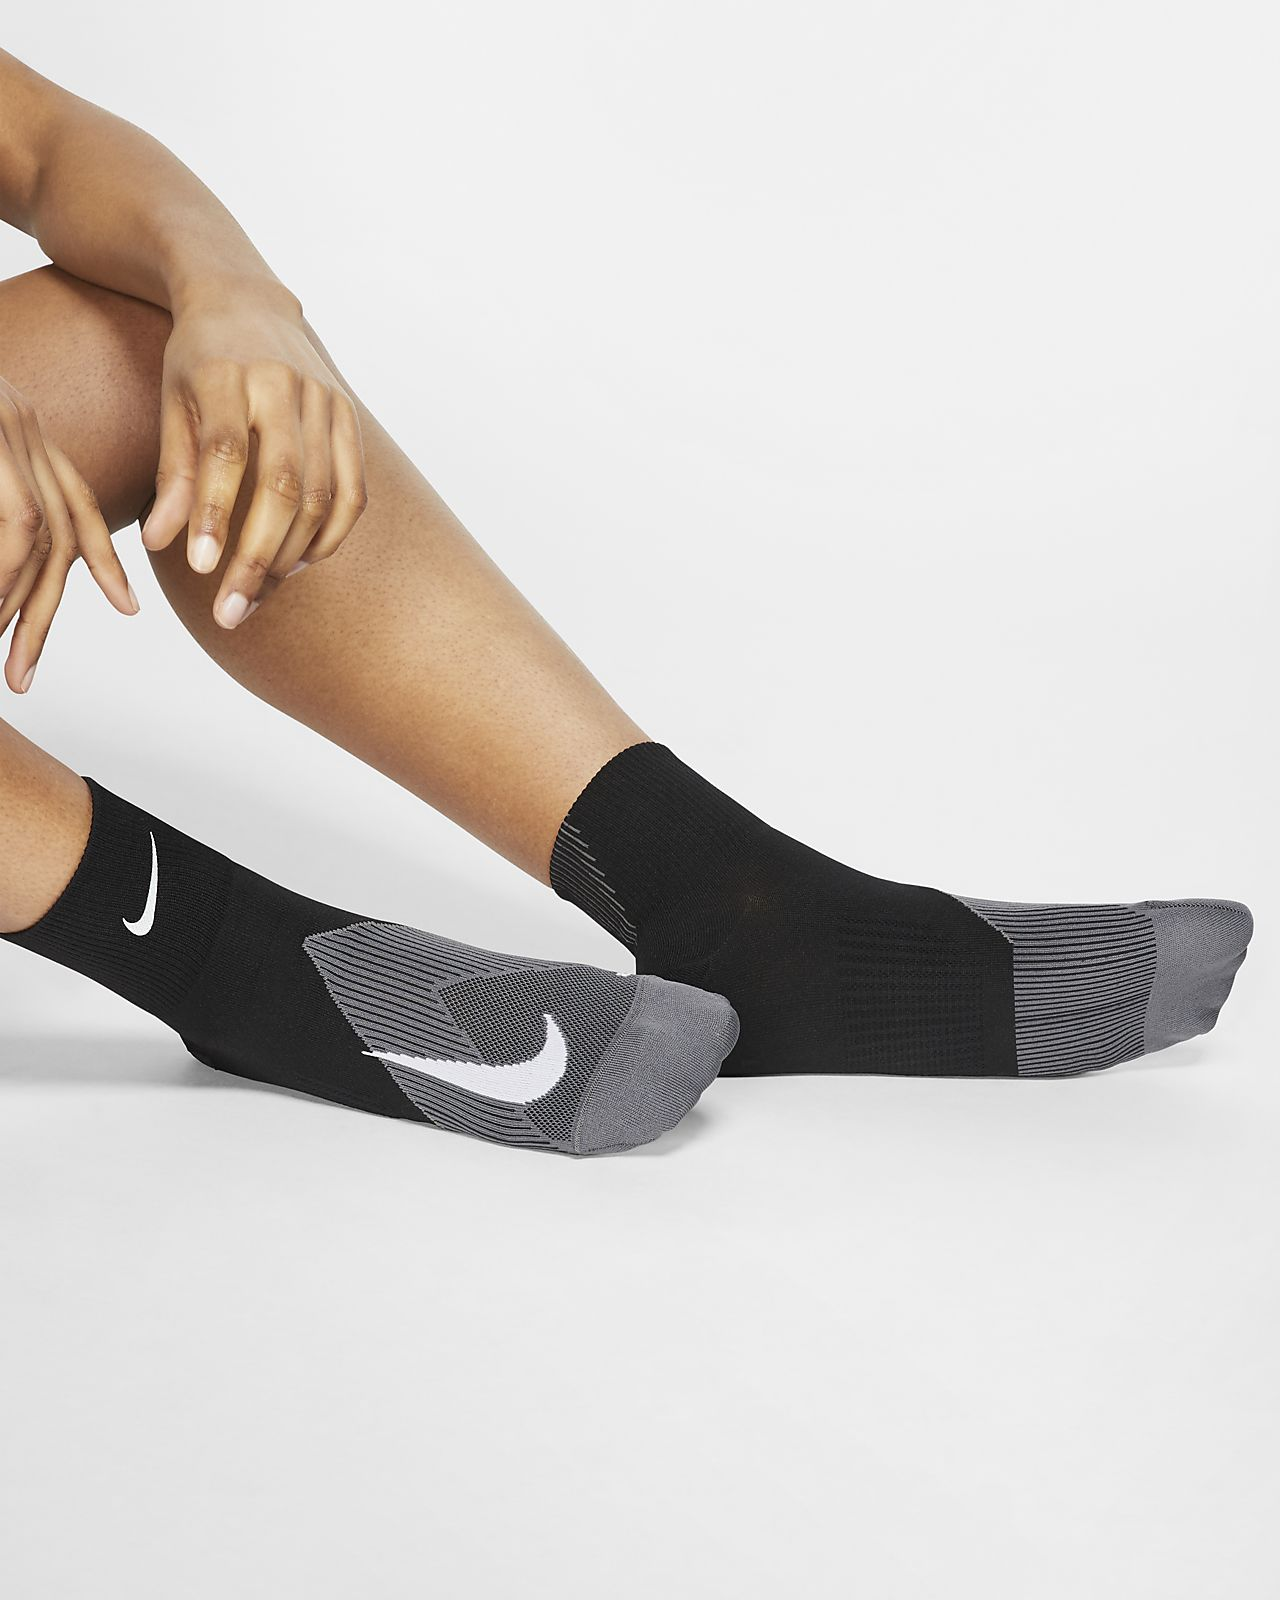 Calze da running Nike Elite Lightweight Crew